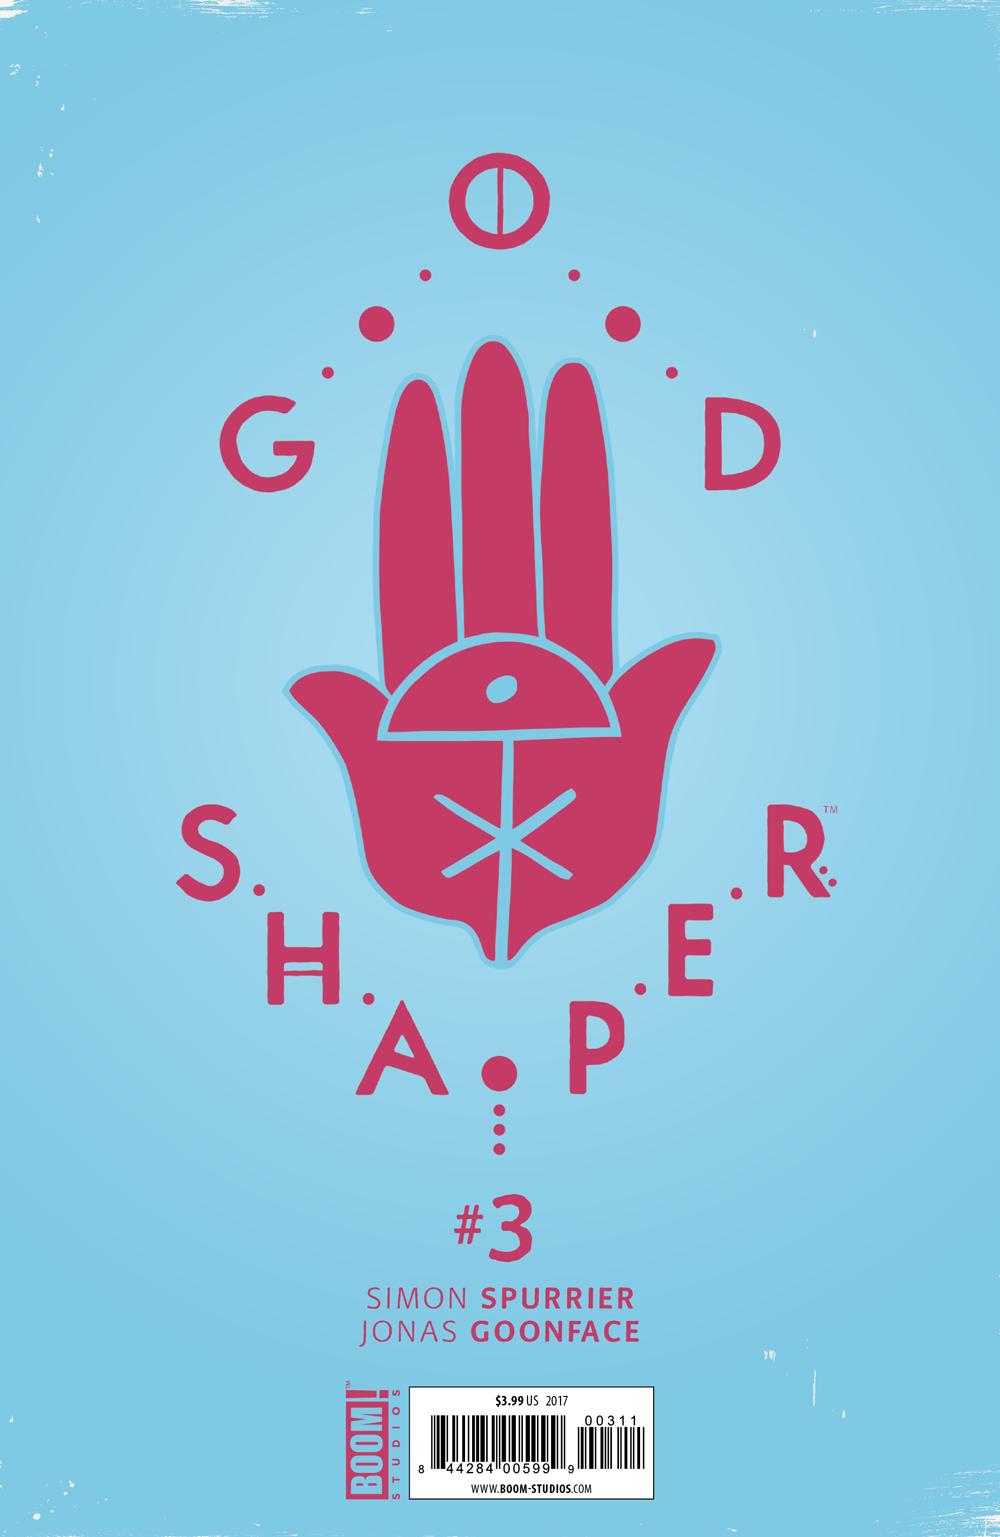 Godshaper_003_2.png